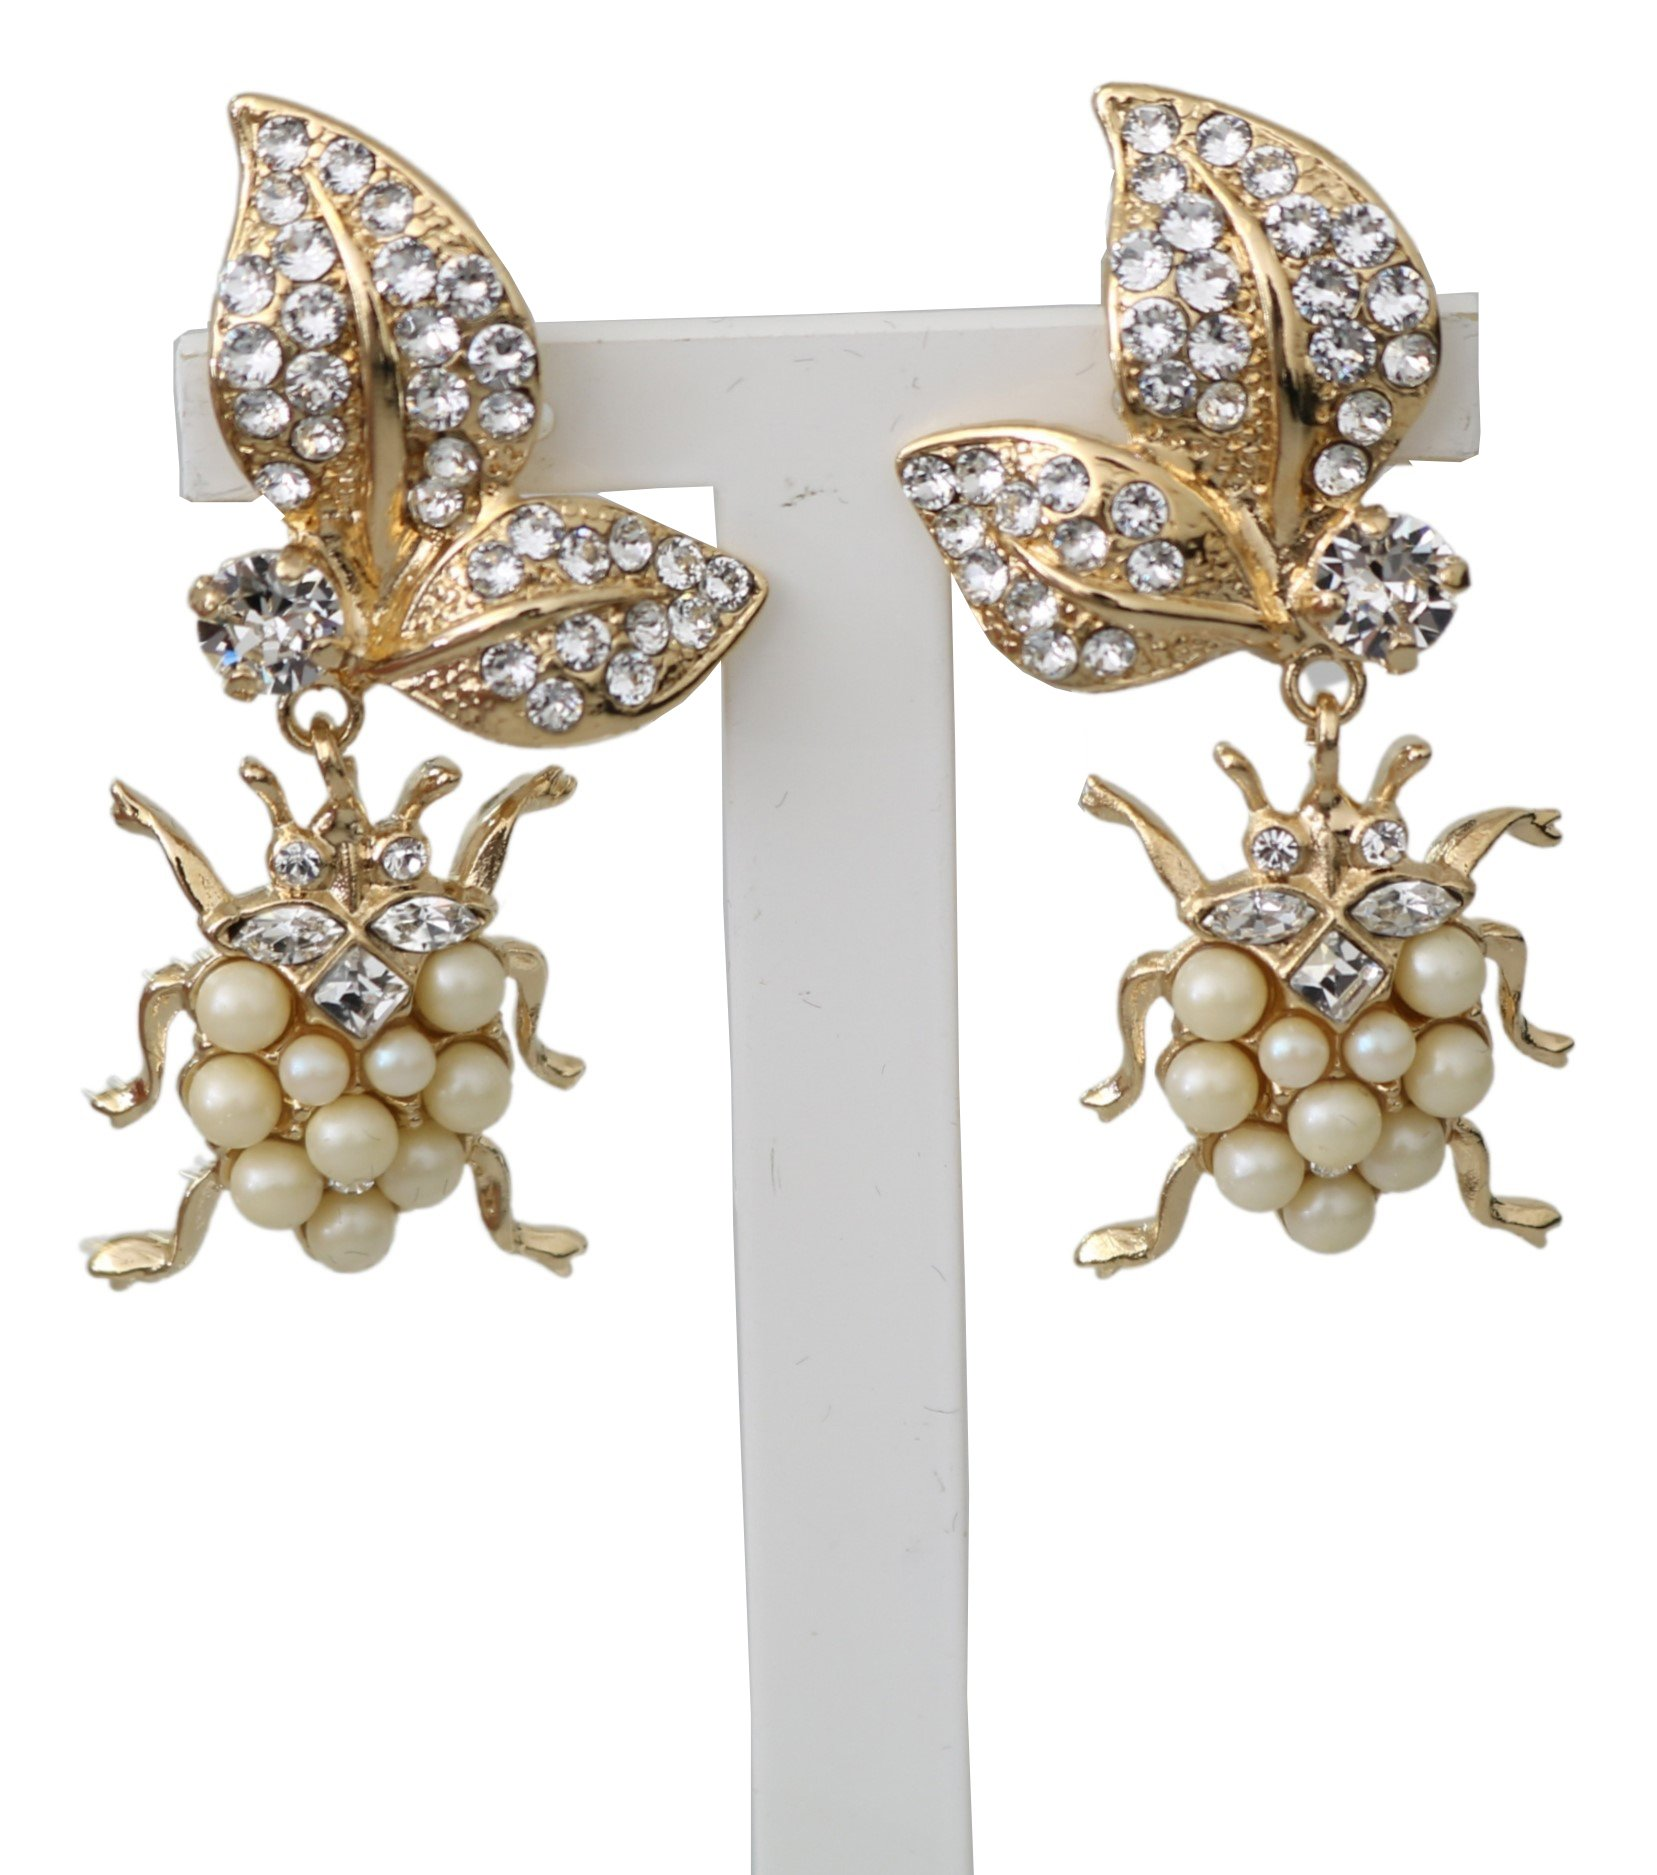 Dolce & Gabbana Women's Brass Clear Floral Clip On Earrings Gold SMY100201